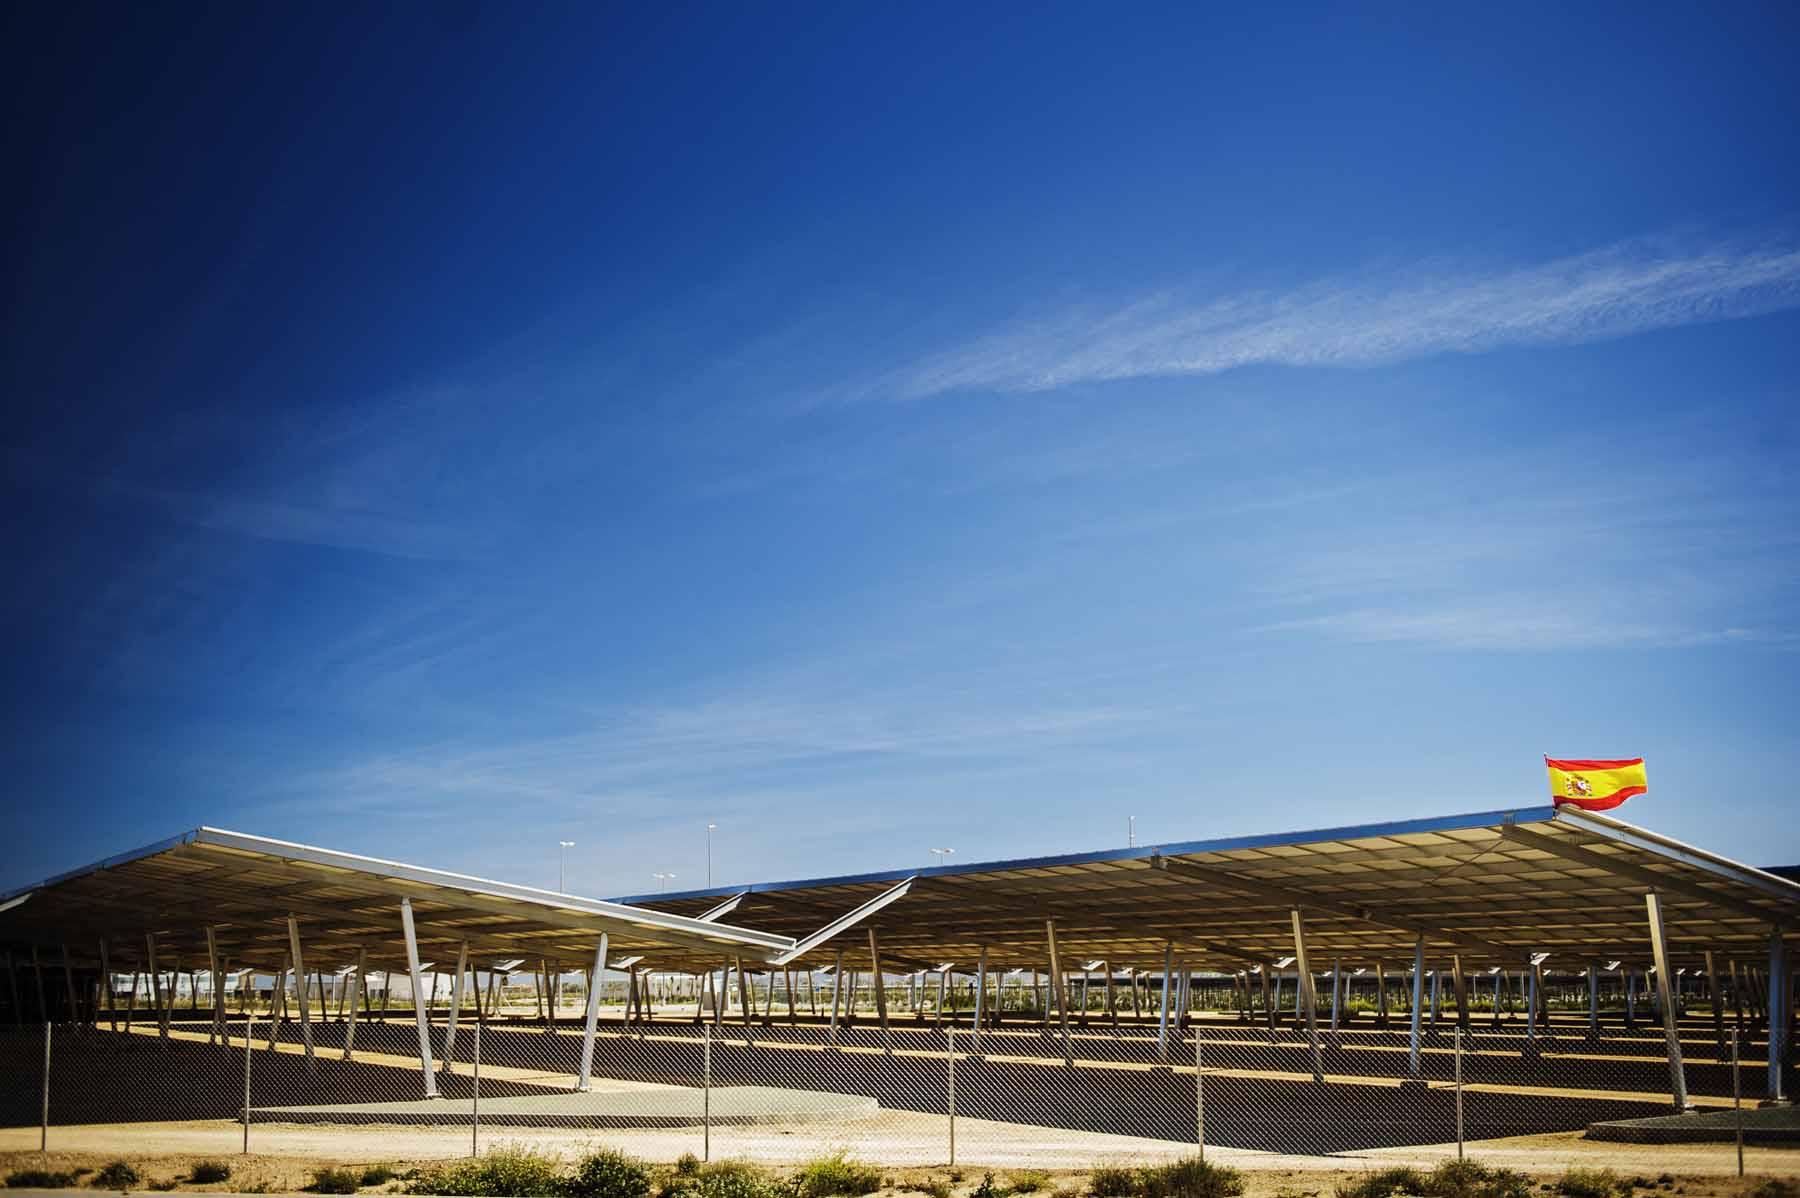 Aeropuerto Internacional de Murcia.